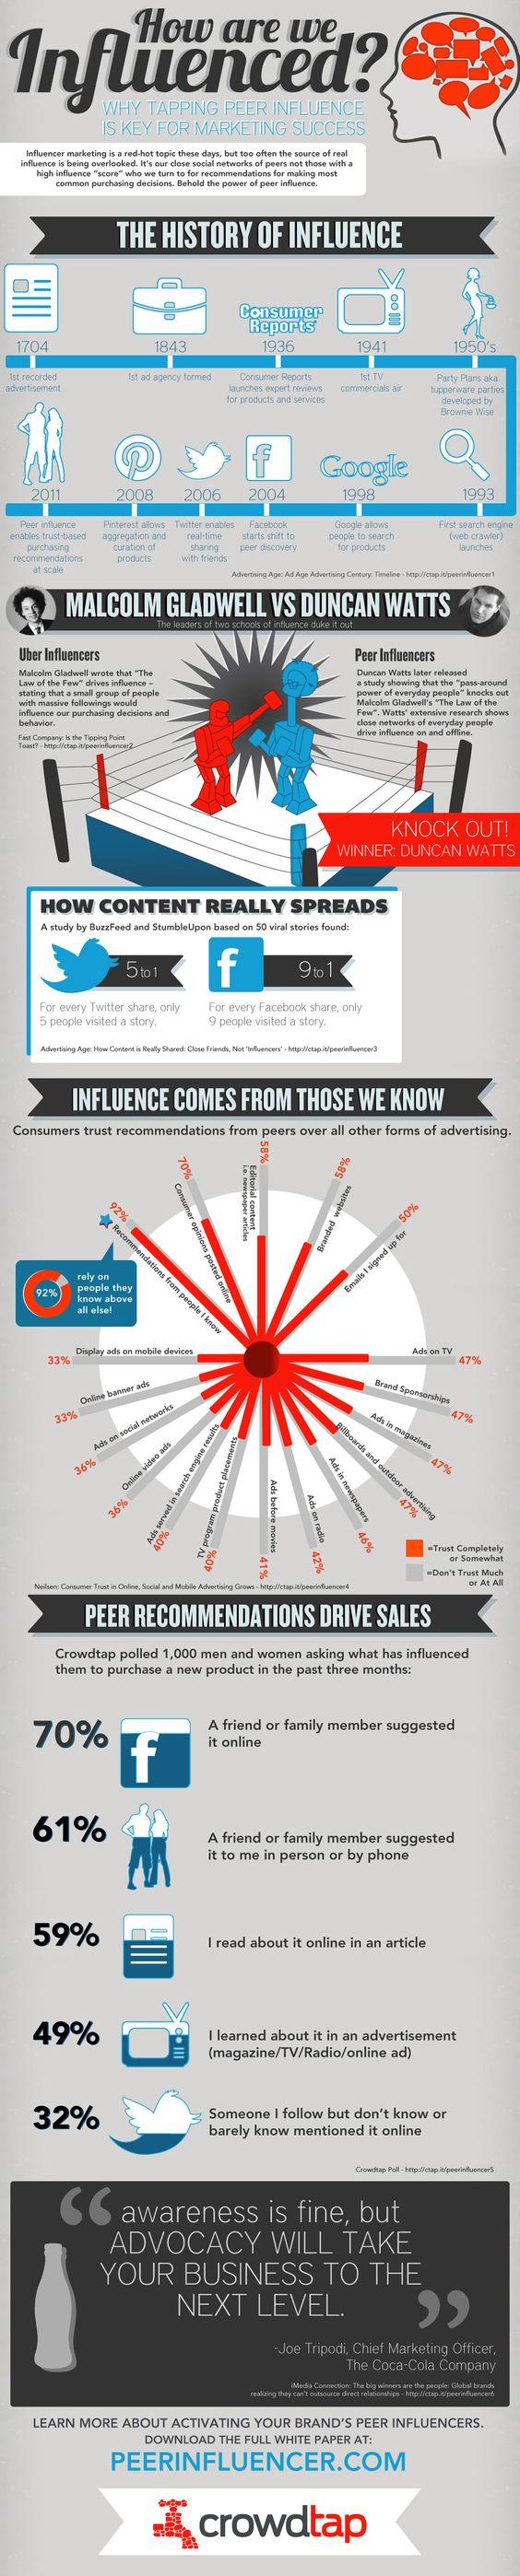 Influence Marketing Infographic